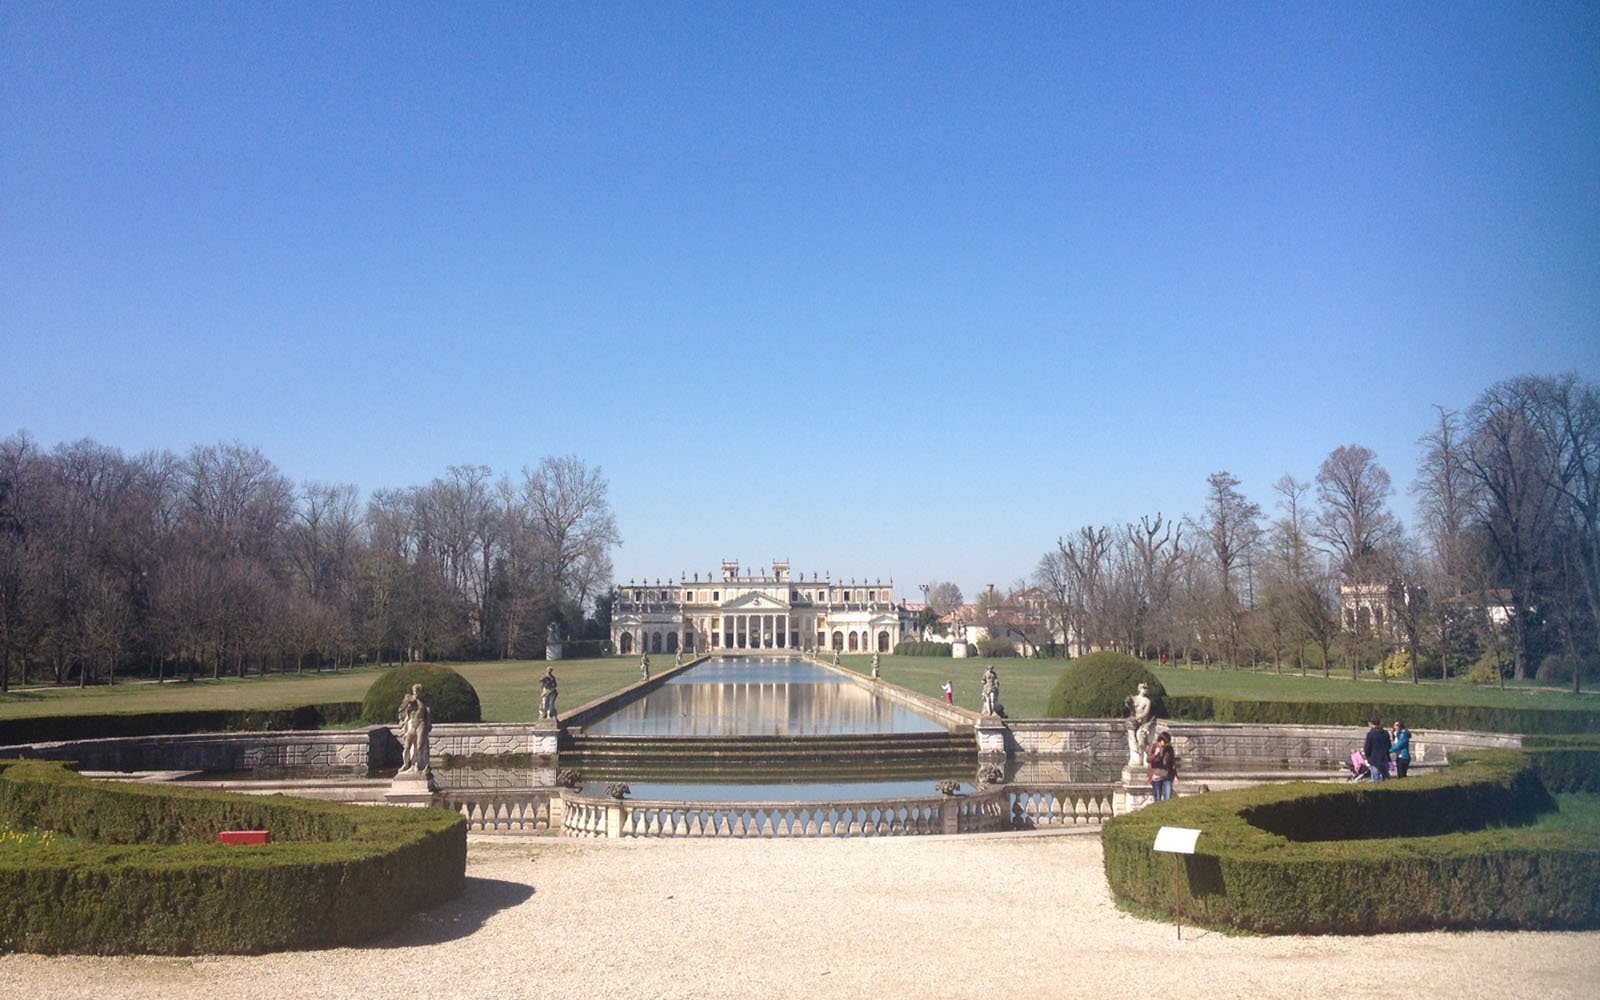 Villa pisani e il giardino degli agrumi oltreilbalcone - Il giardino degli esperidi ...